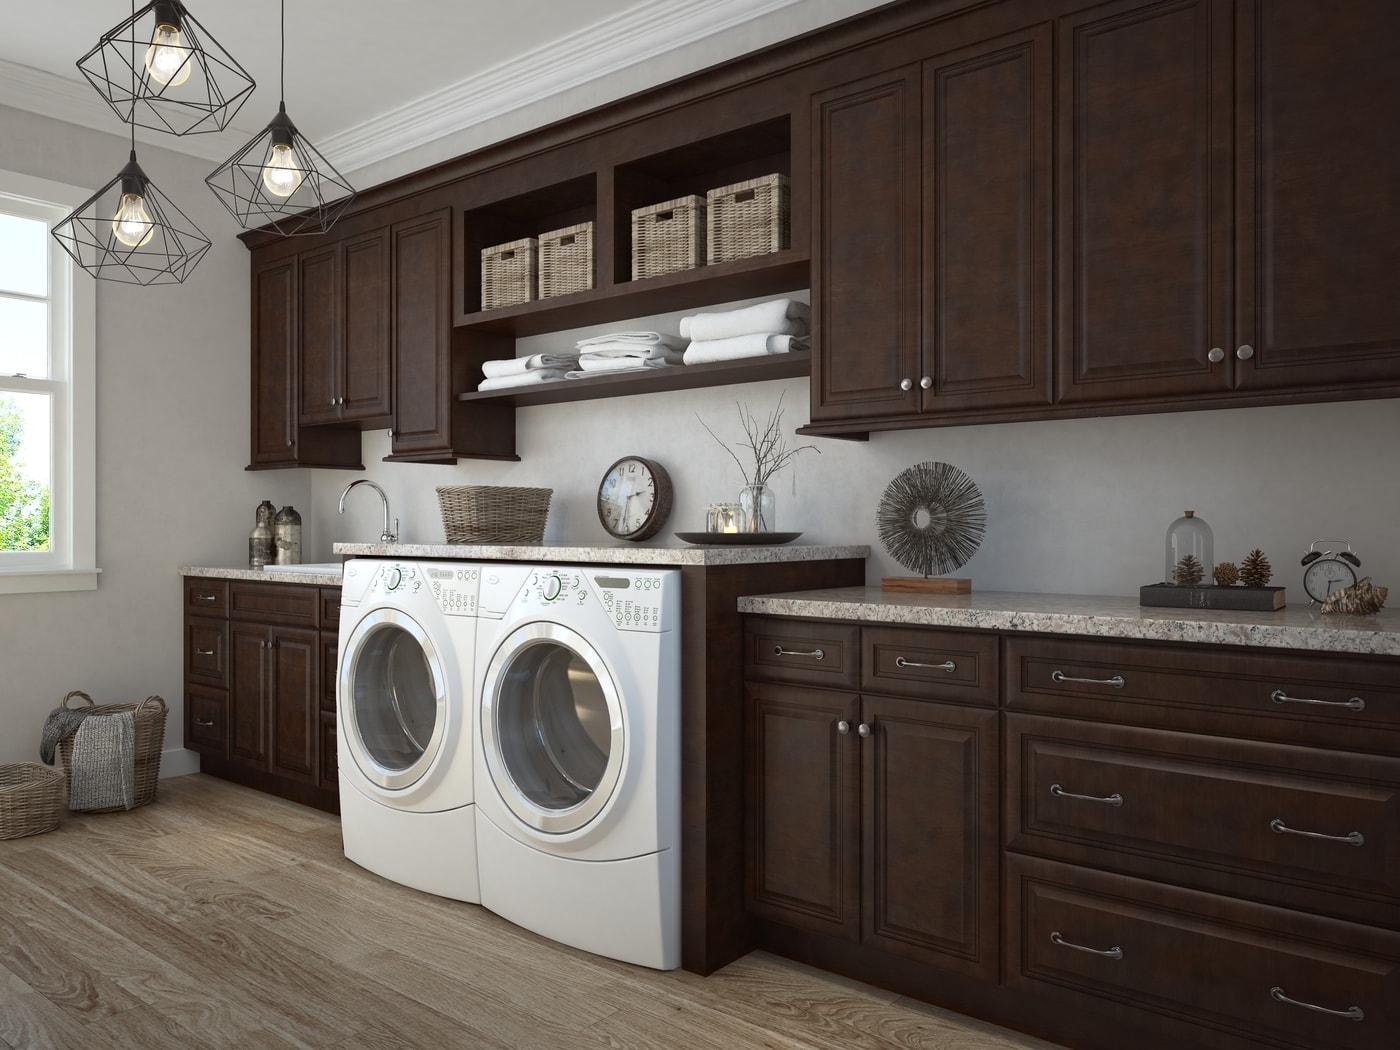 Regency Espresso RTA Laundry Room Cabinets - The RTA Store on Laundry Room Cabinets  id=12694